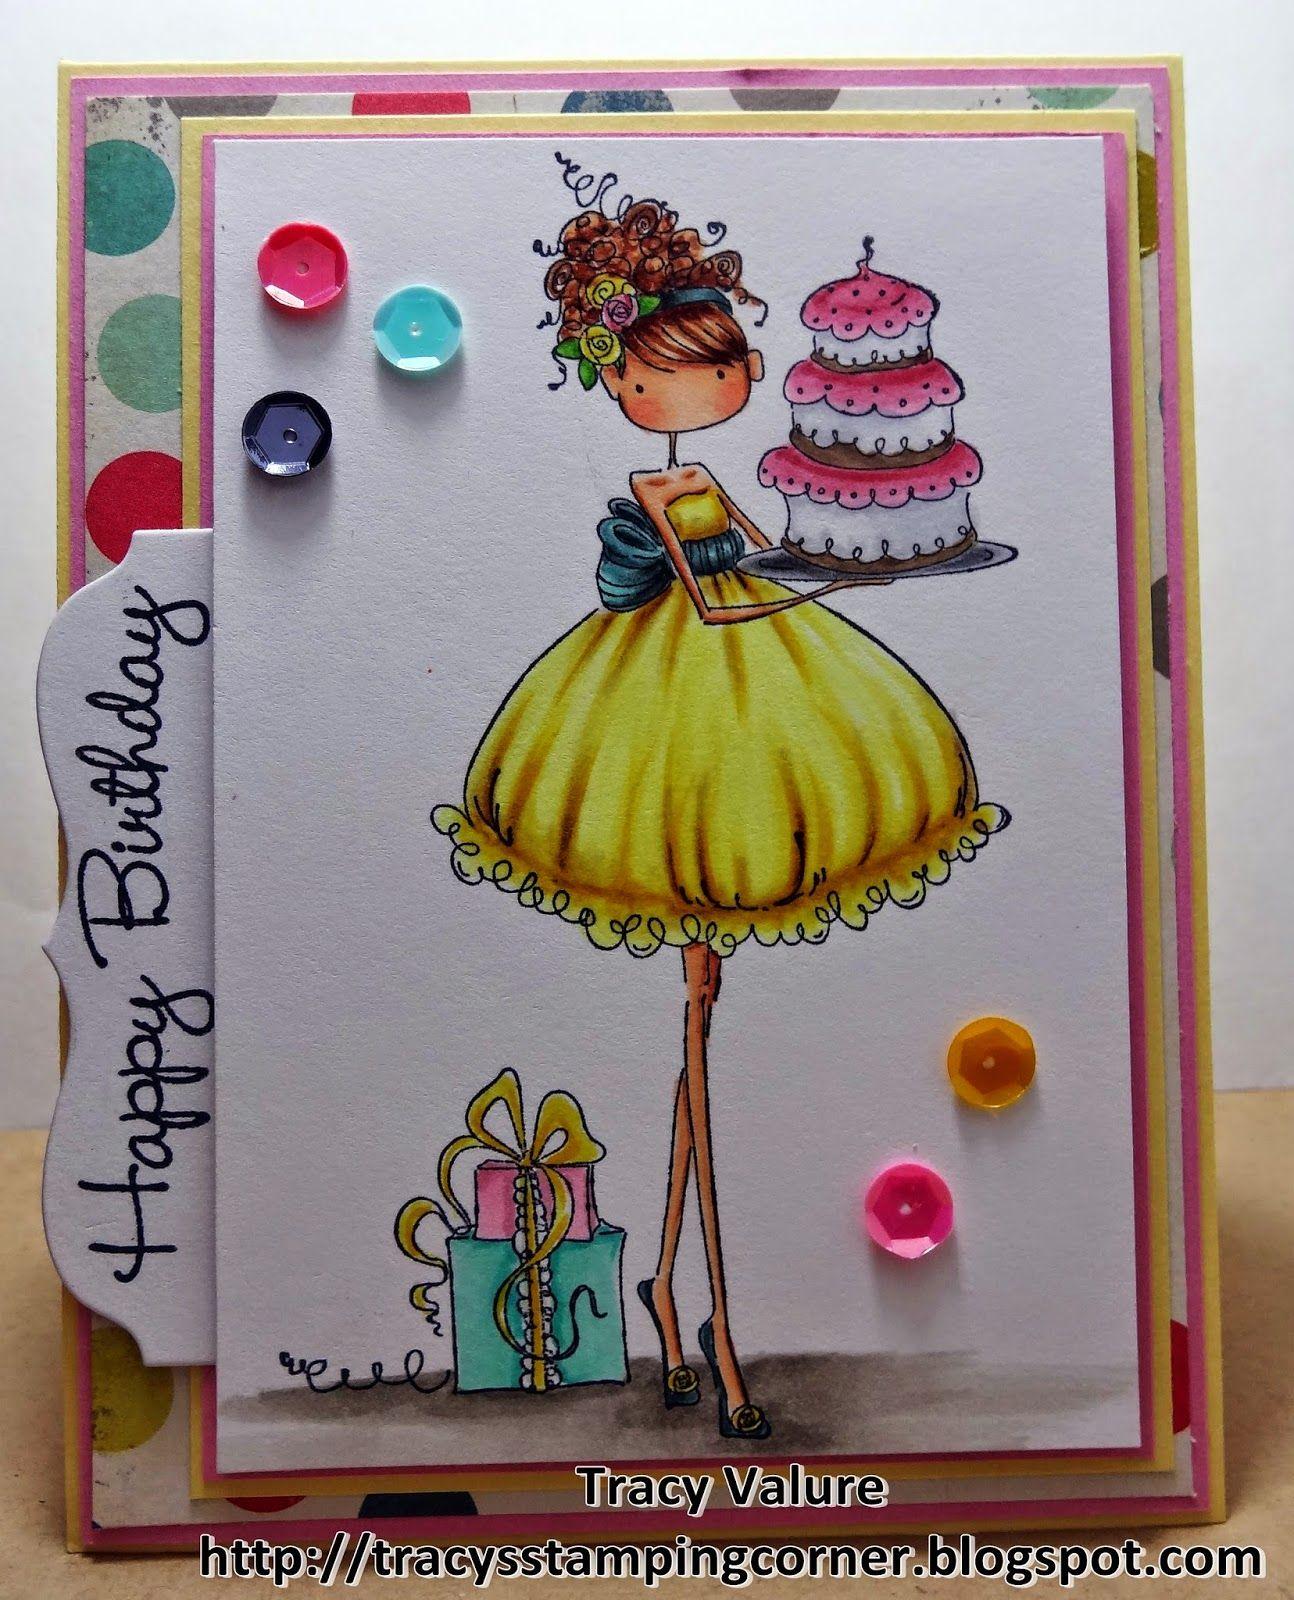 Tracy's Stamping Corner: Happy Birthday Stamping Bella